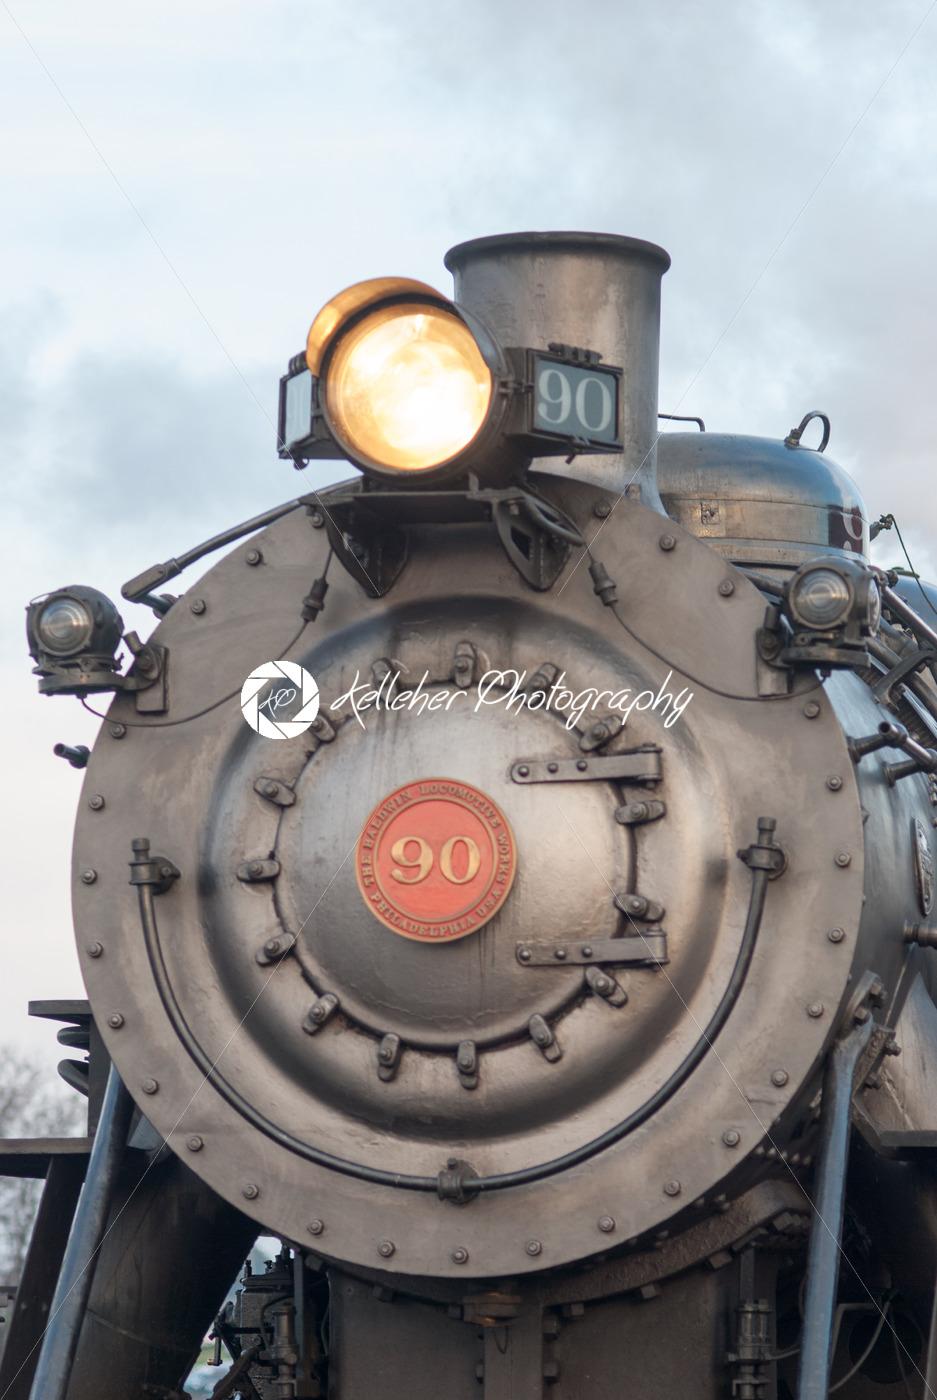 STRASBURG, PA – DECEMBER 15: Steam Locomotive in Strasburg, Pennsylvania on December 15, 2012 - Kelleher Photography Store